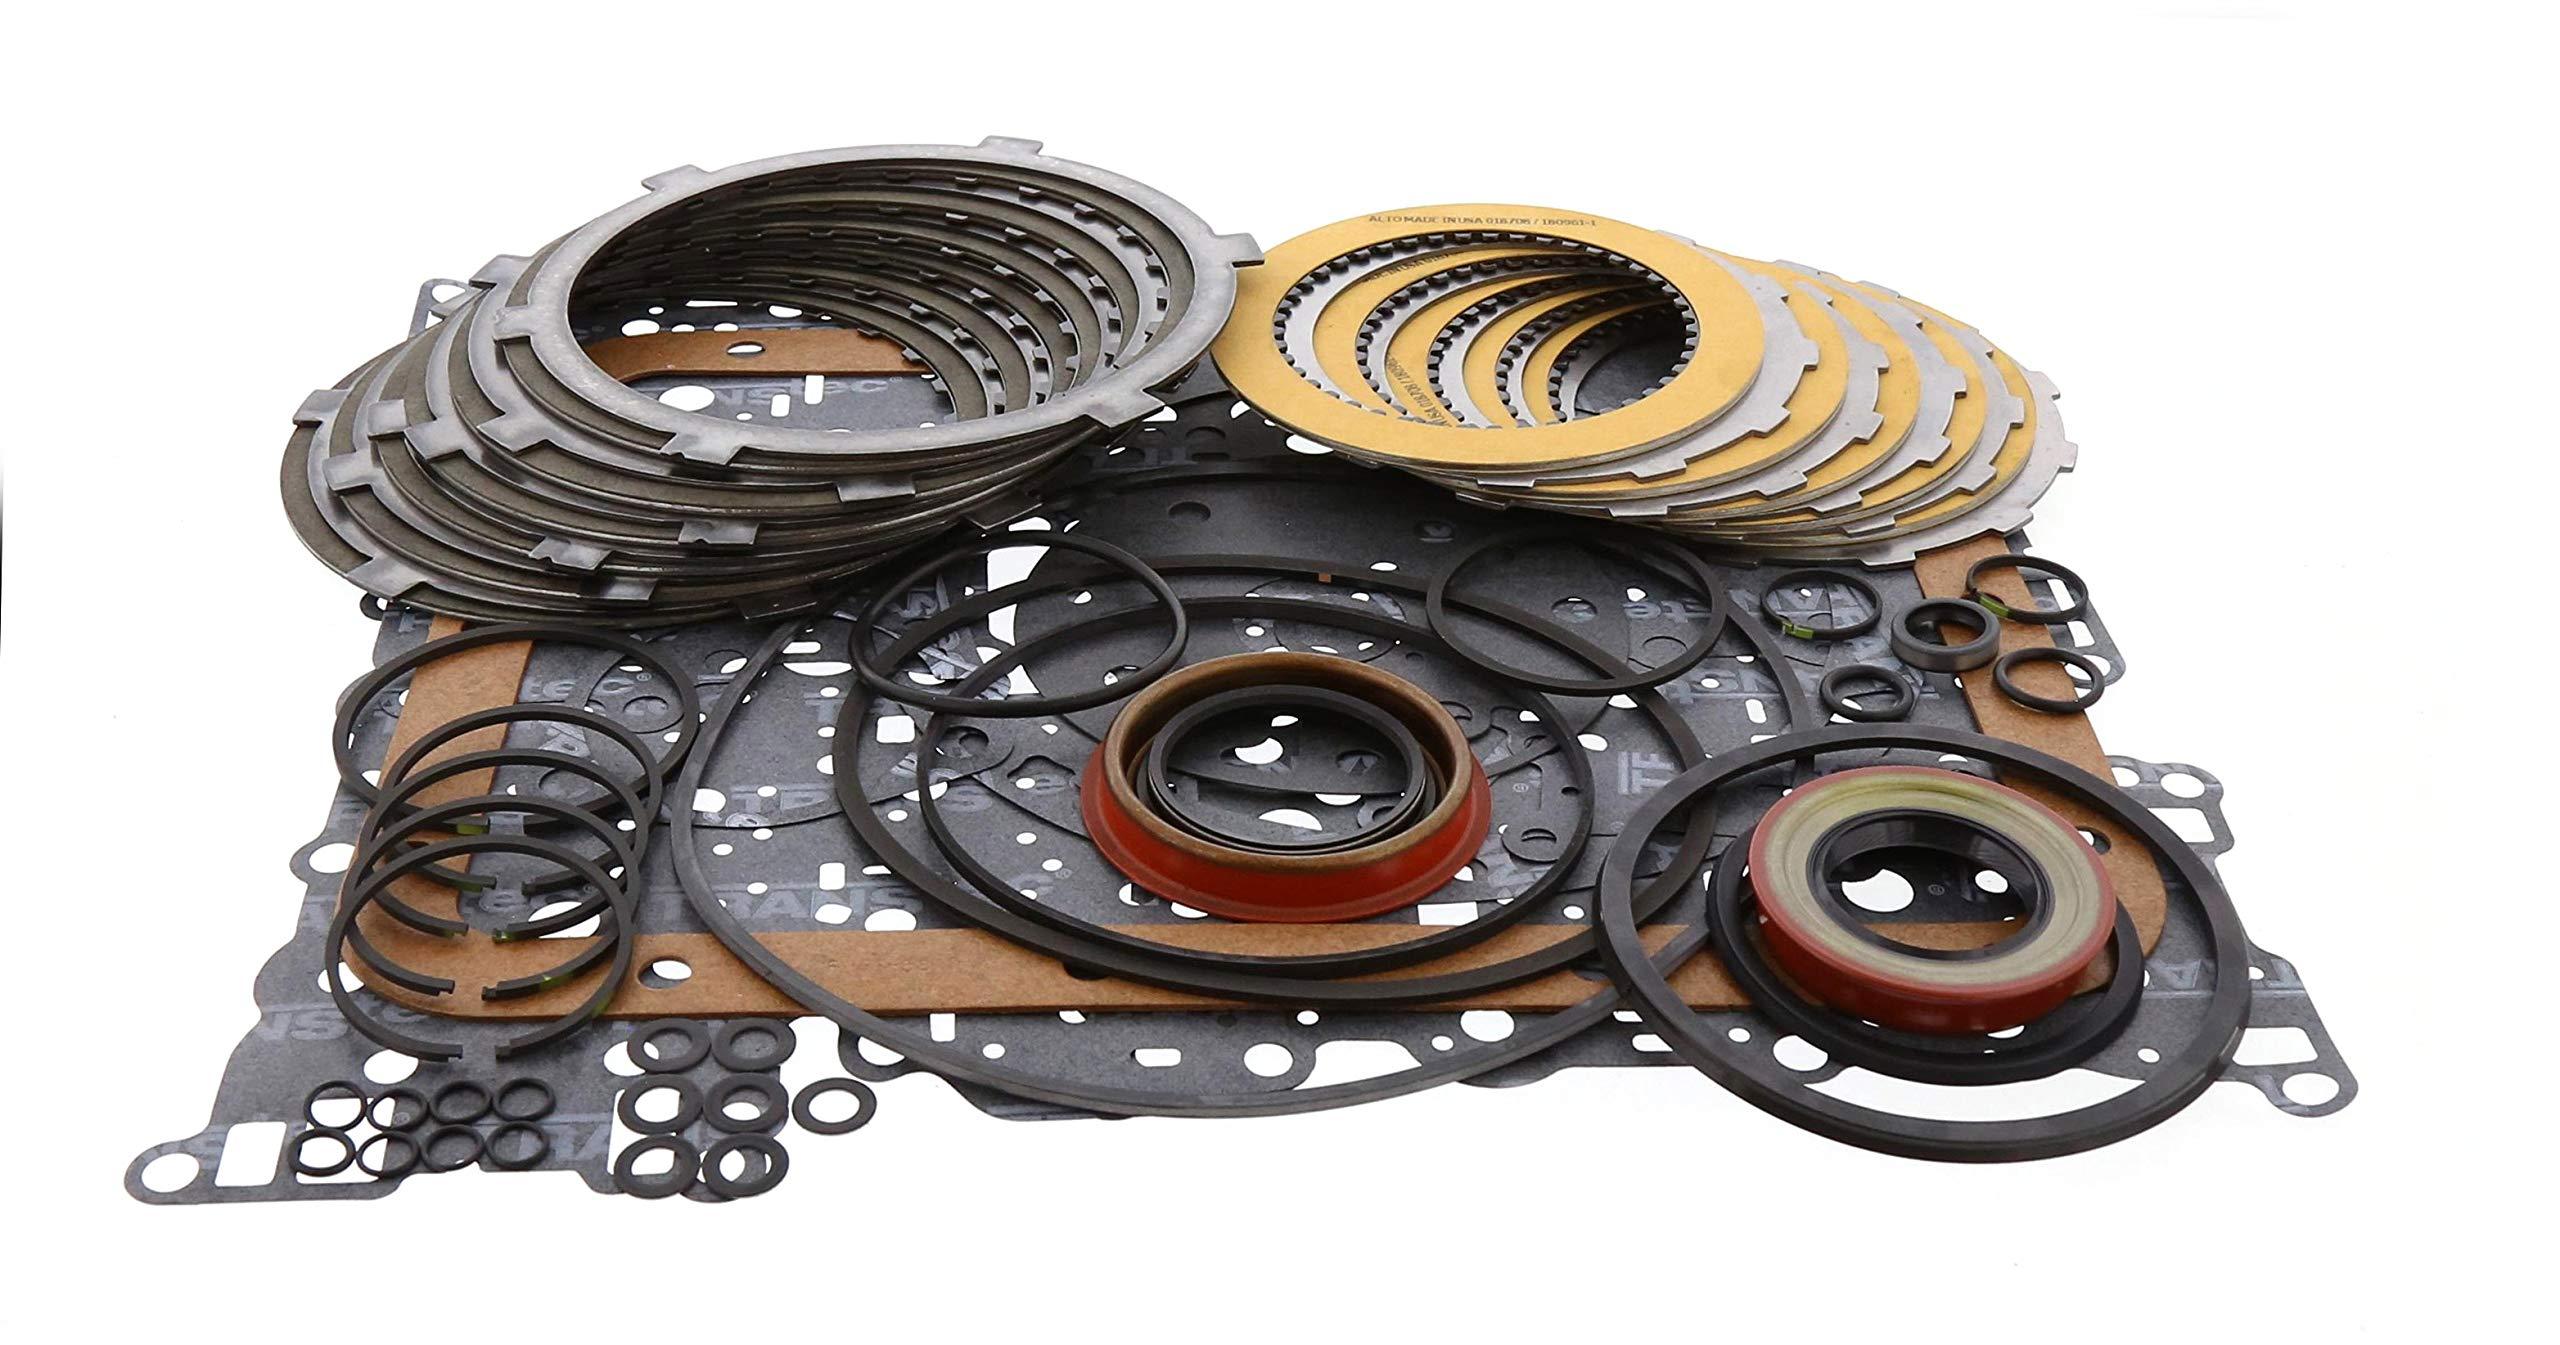 Chevy Pontiac Powerglide Transmission Master Rebuild Kit 62-73